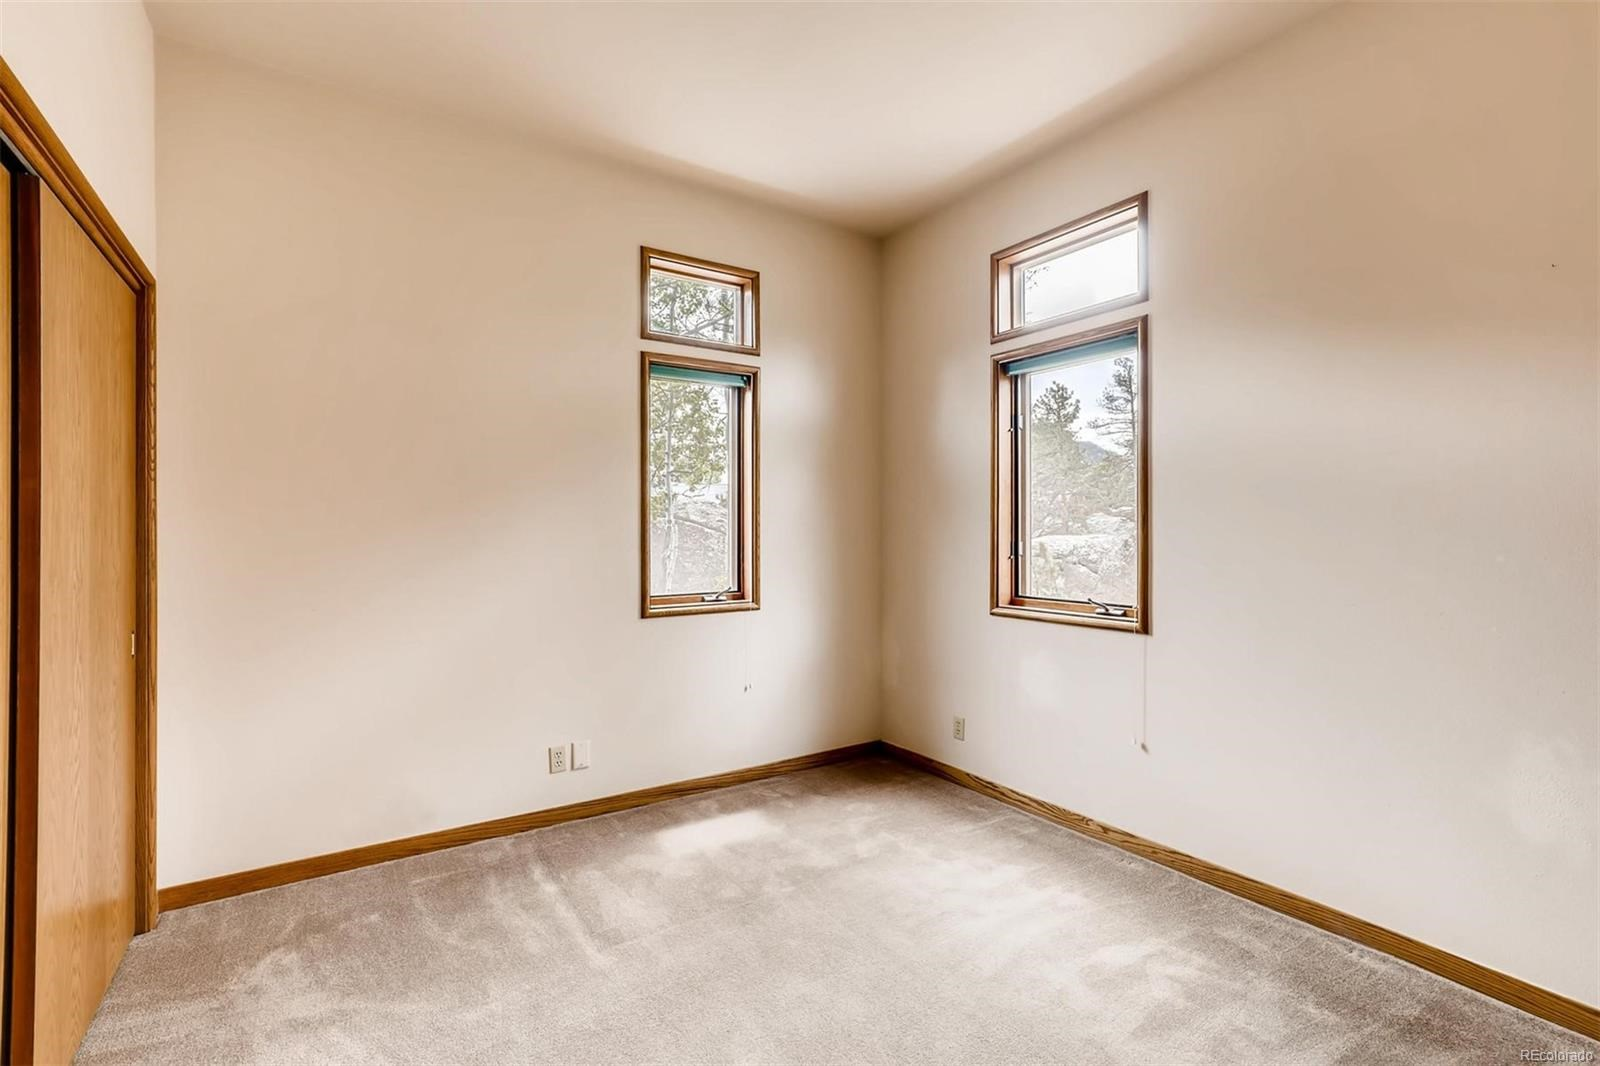 MLS# 1860767 - 1 - 340  Homesteader Lane, Estes Park, CO 80517